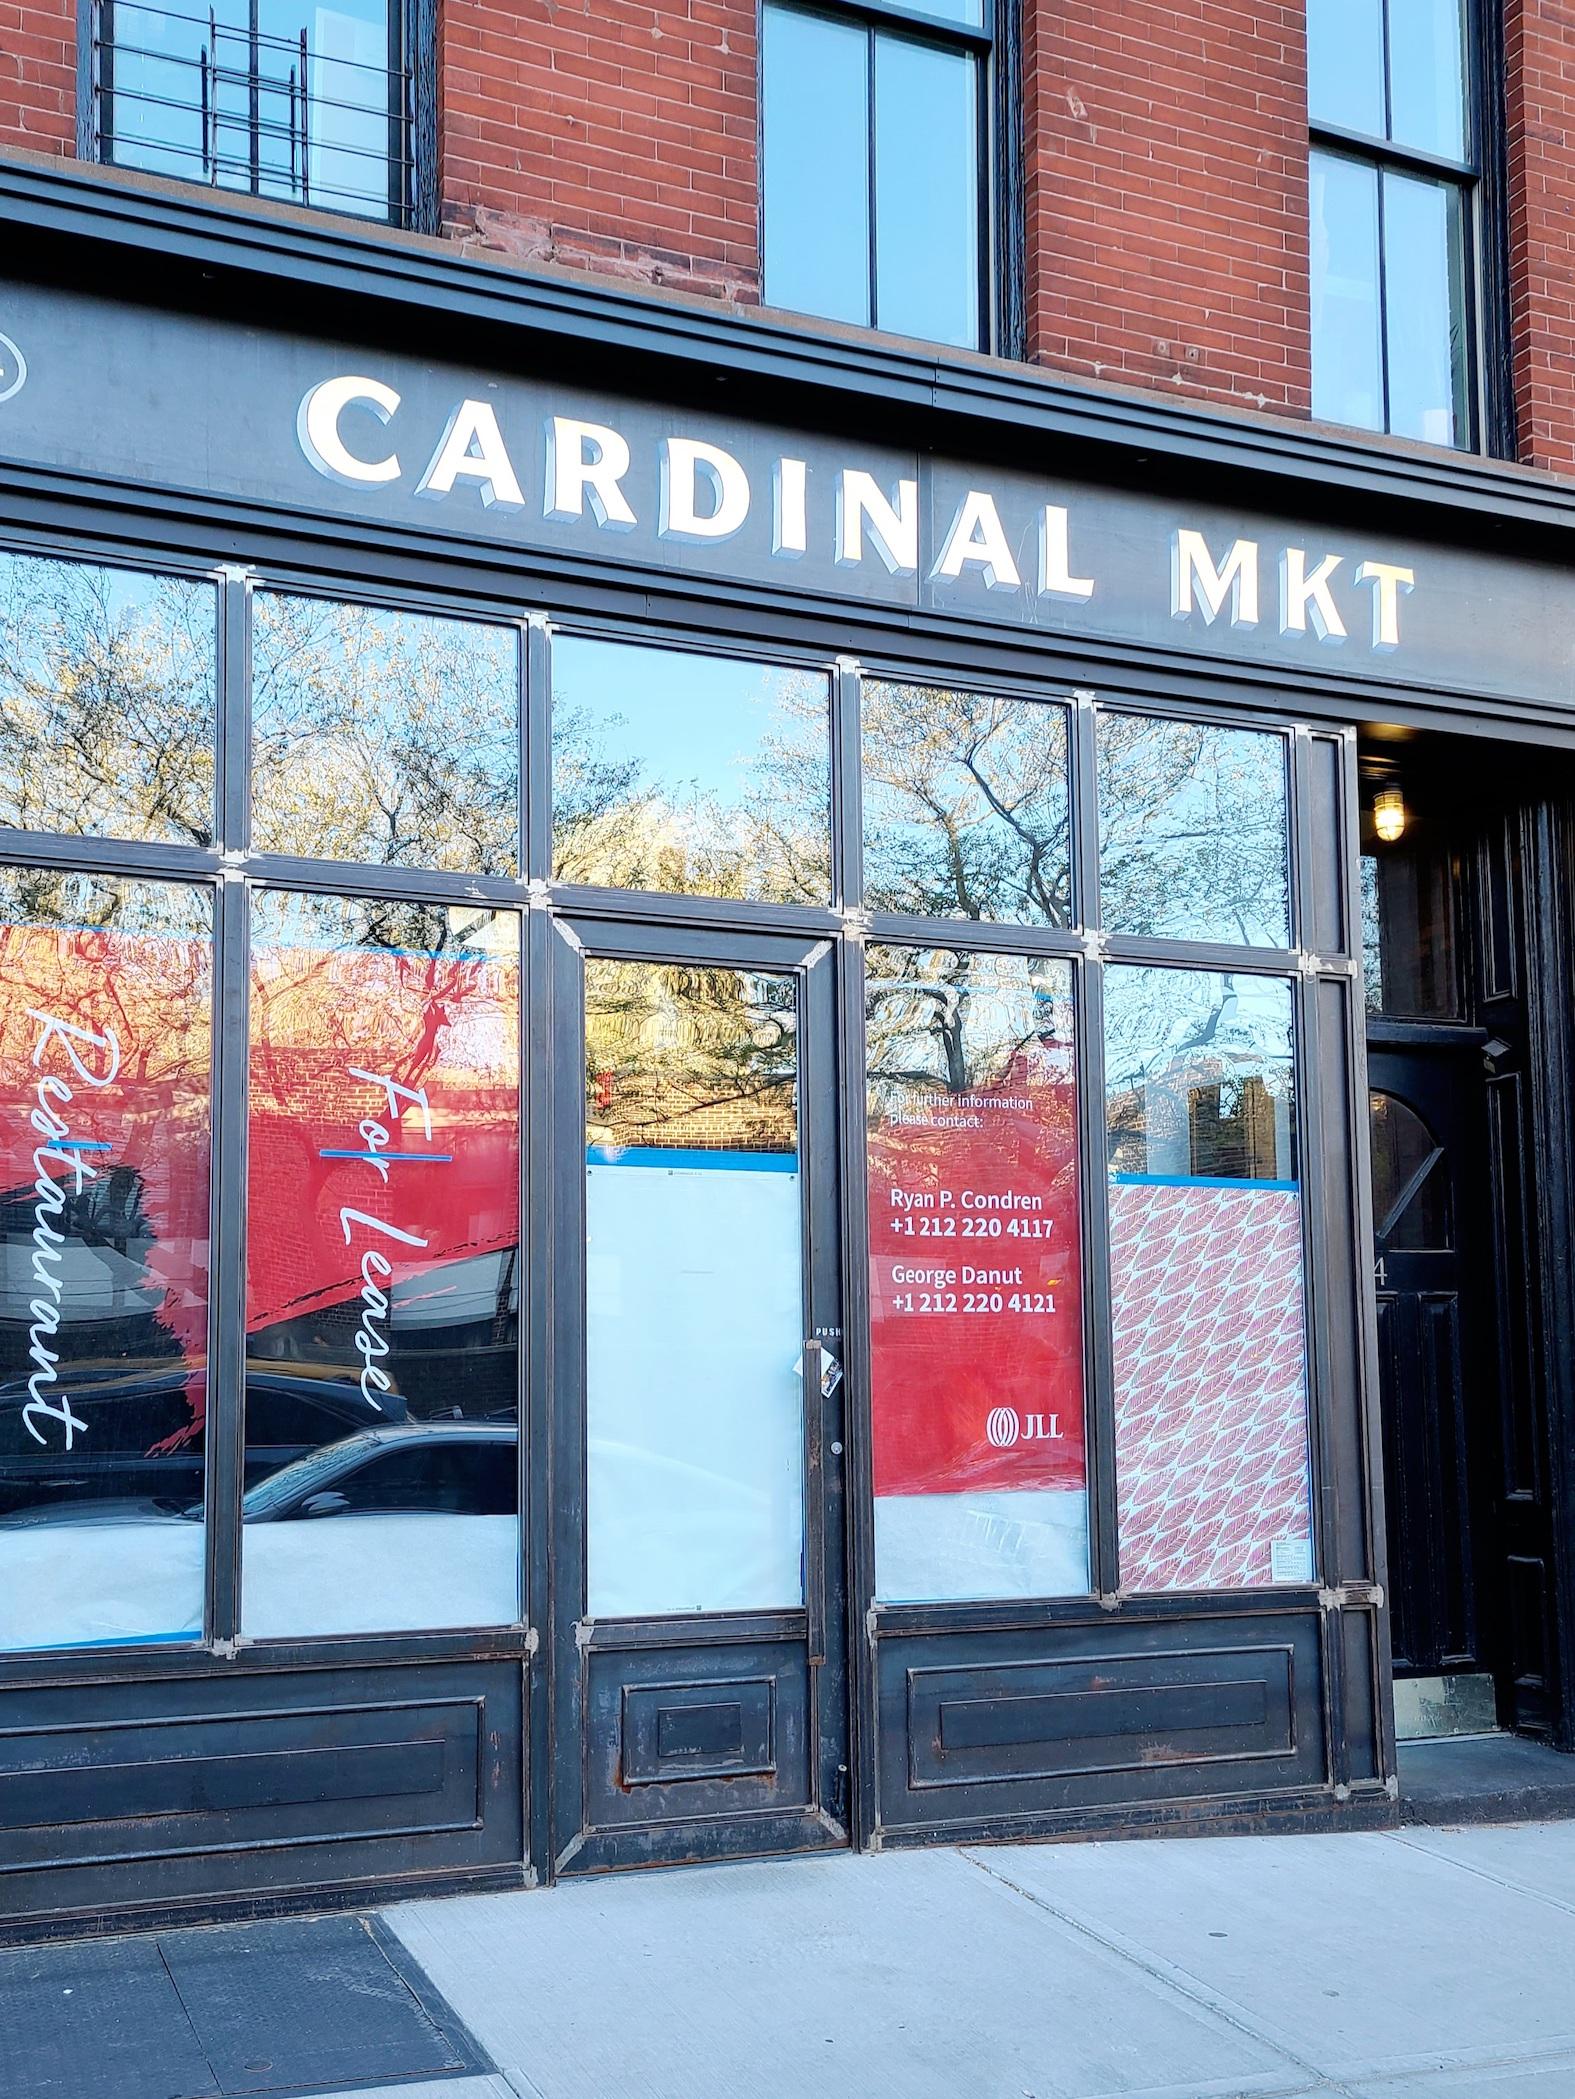 Cardinal Mkt